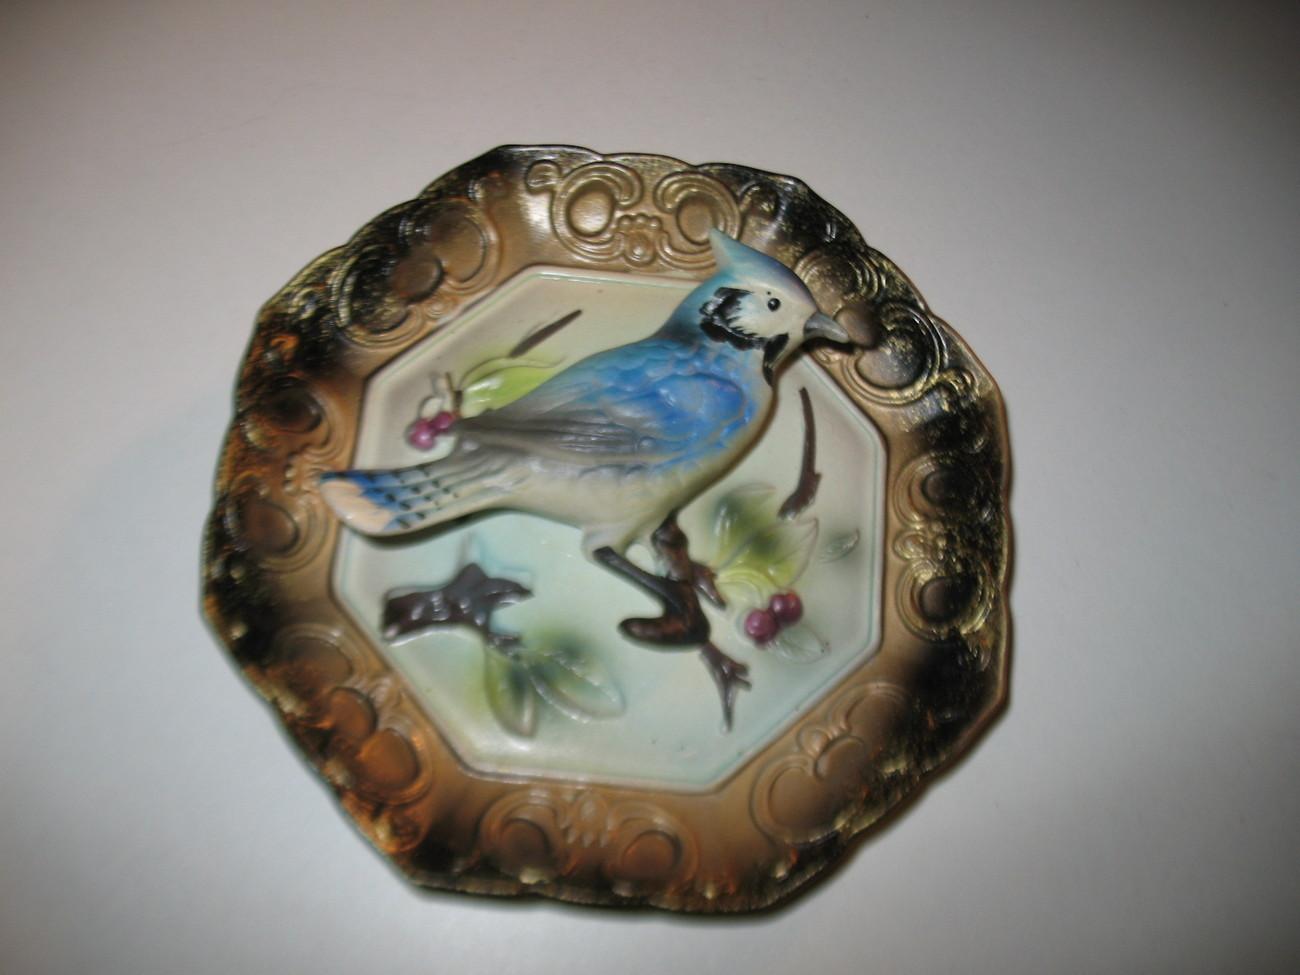 Decorative Wall Plates Nz : Vintage napcoware blue jay wall plate plaque d bird napco